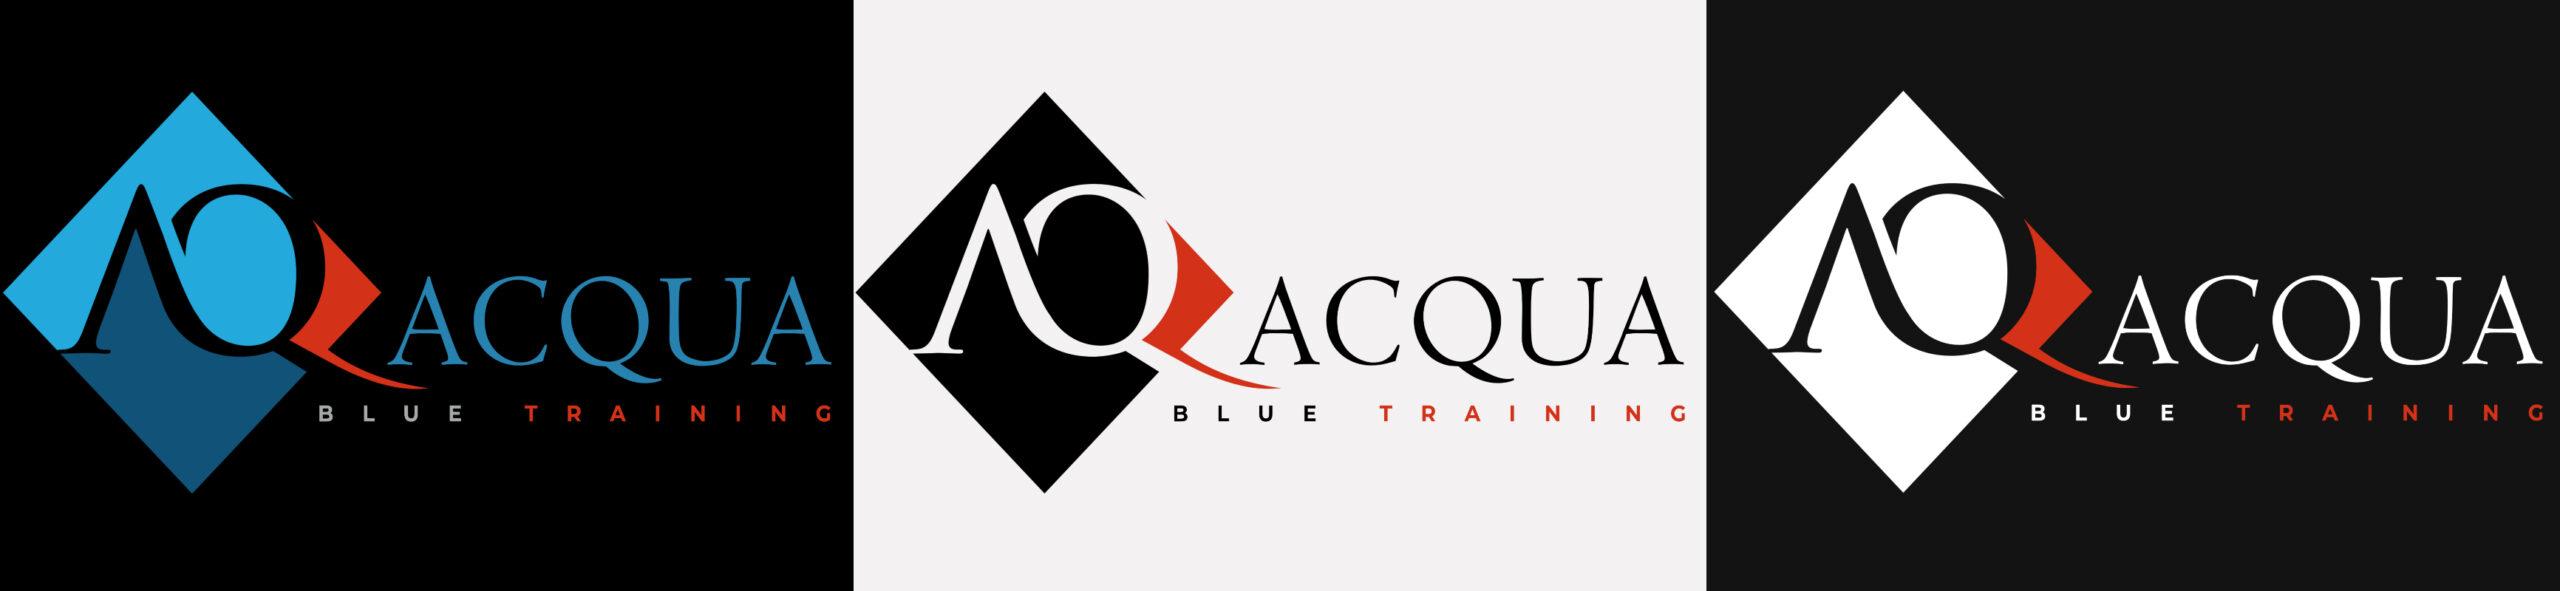 acqua-blue-training-logo-variants